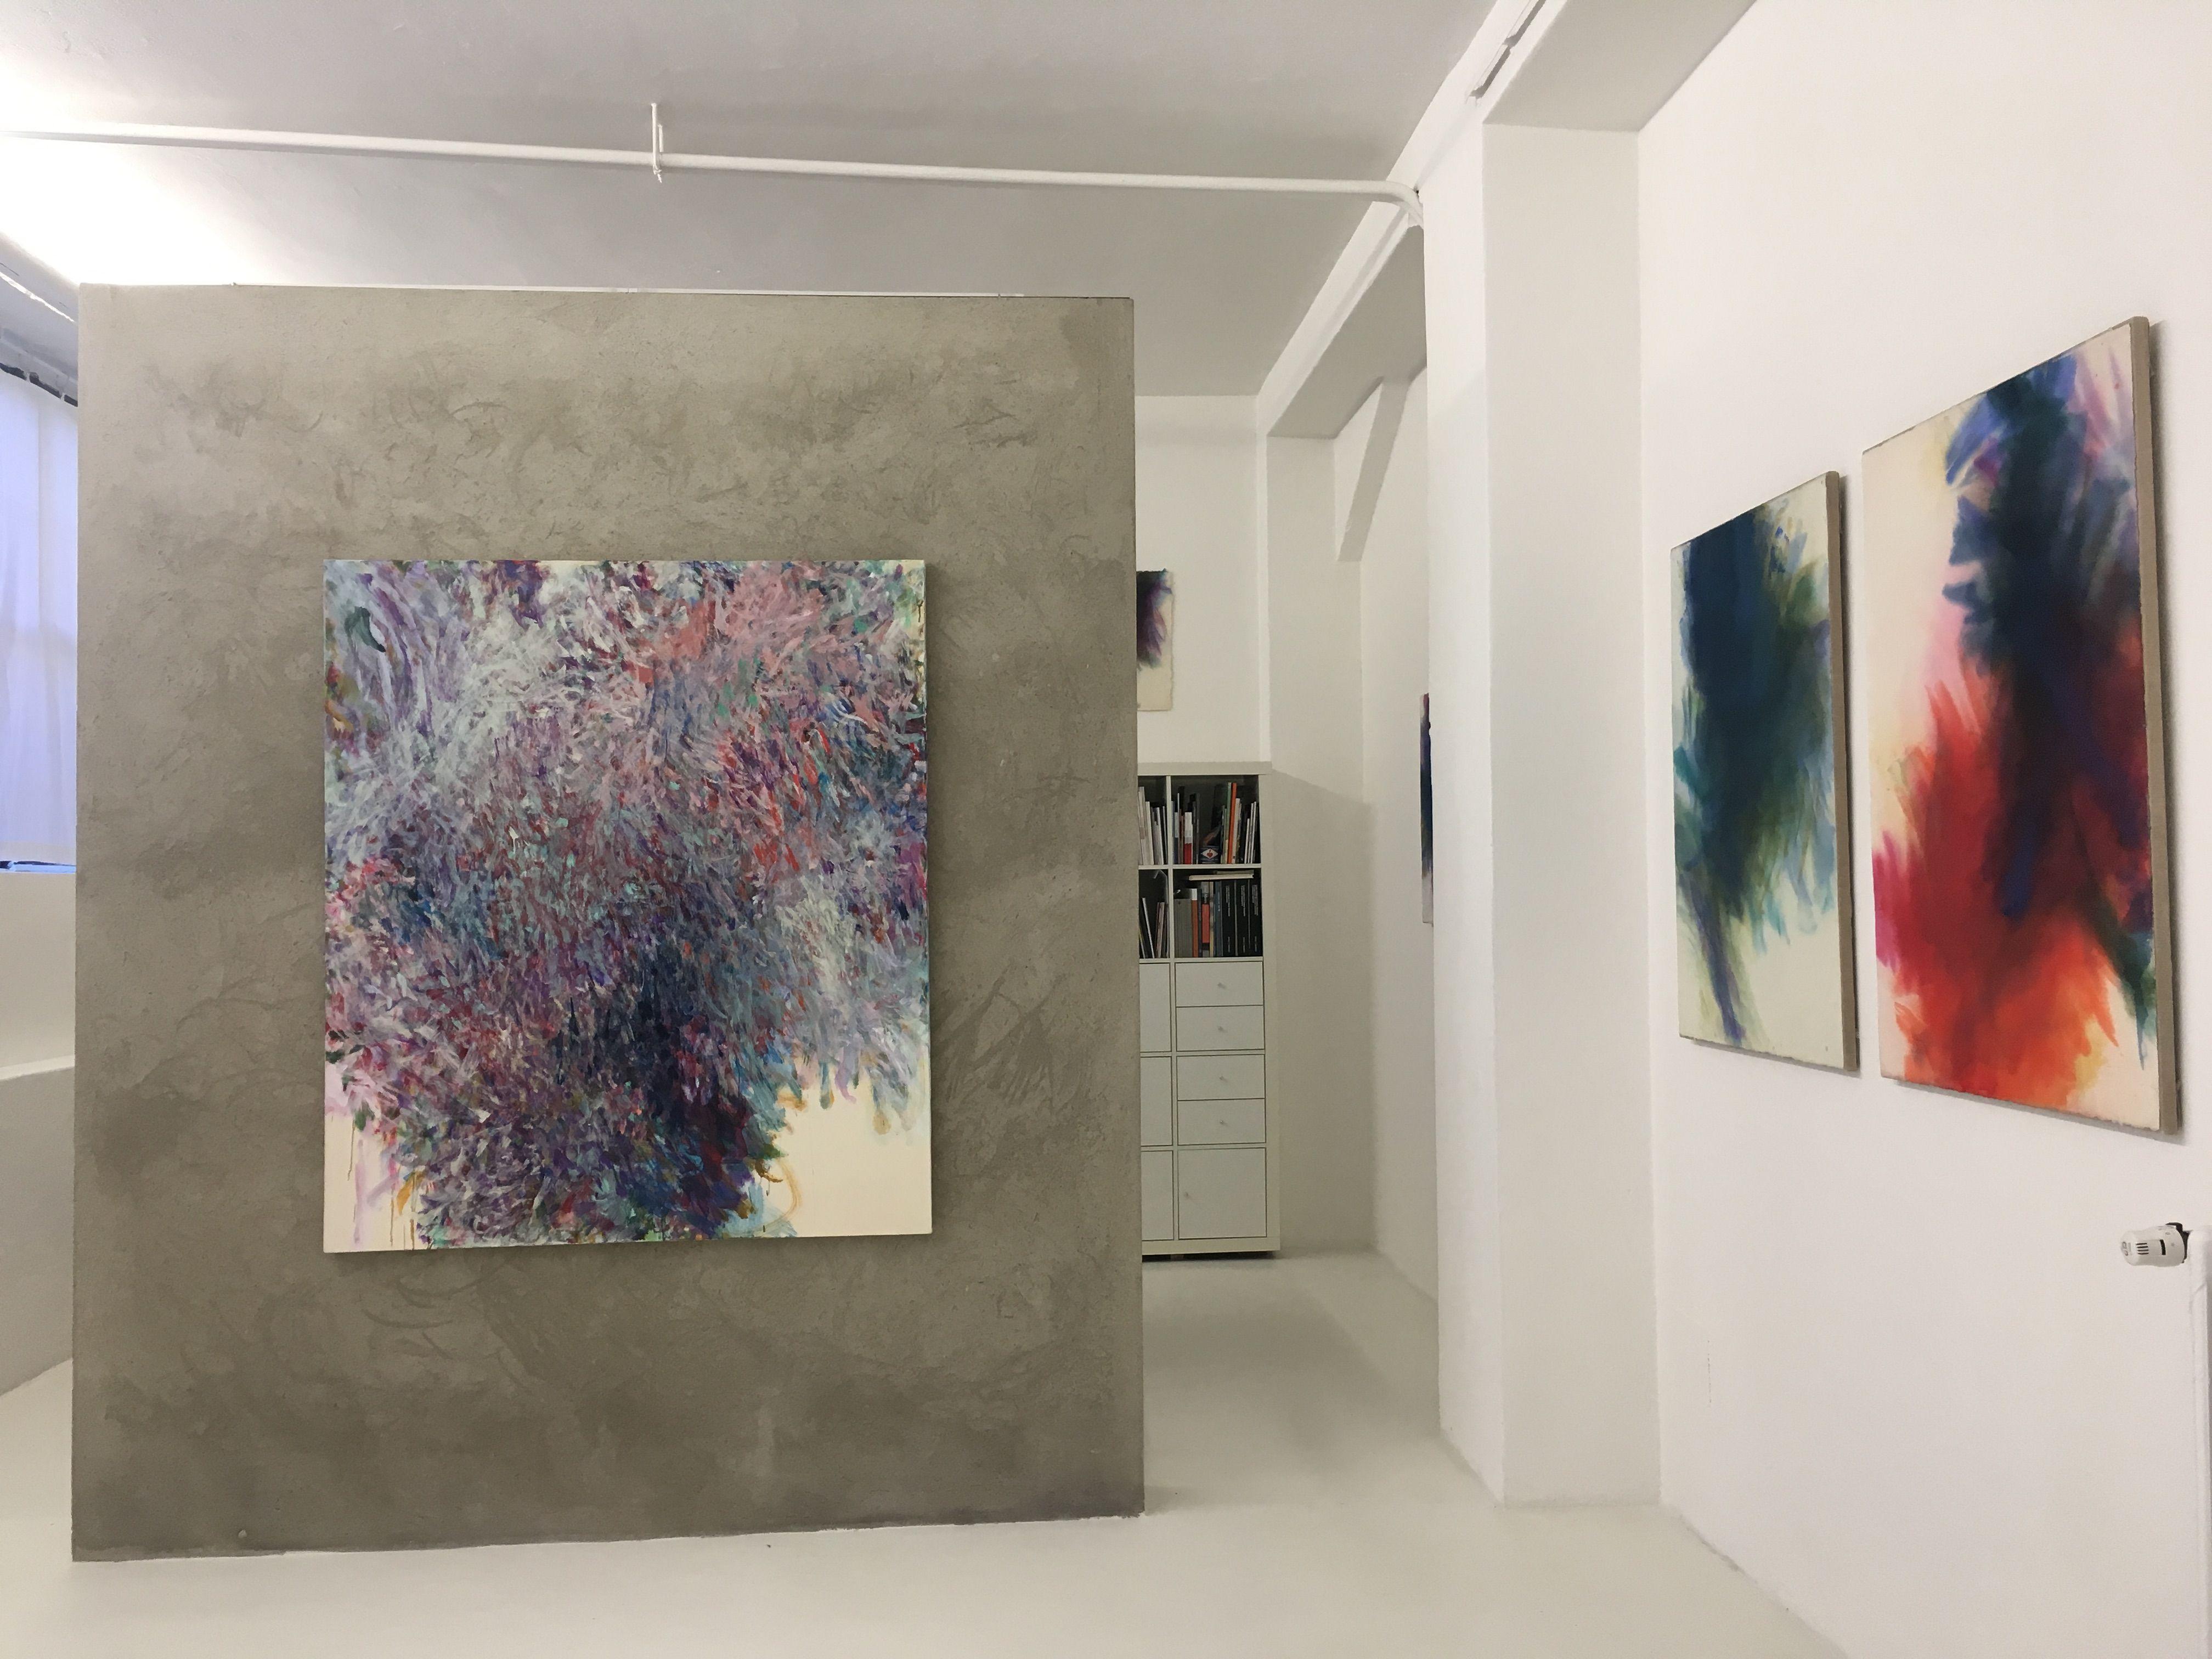 AYAKO NAKAMIYA, Petalo verso ...petalo recto, a cura di Claudio Cerritelli, 6 ottobre - 11 novembre 2016, STUDIO MASIERO, MILANO